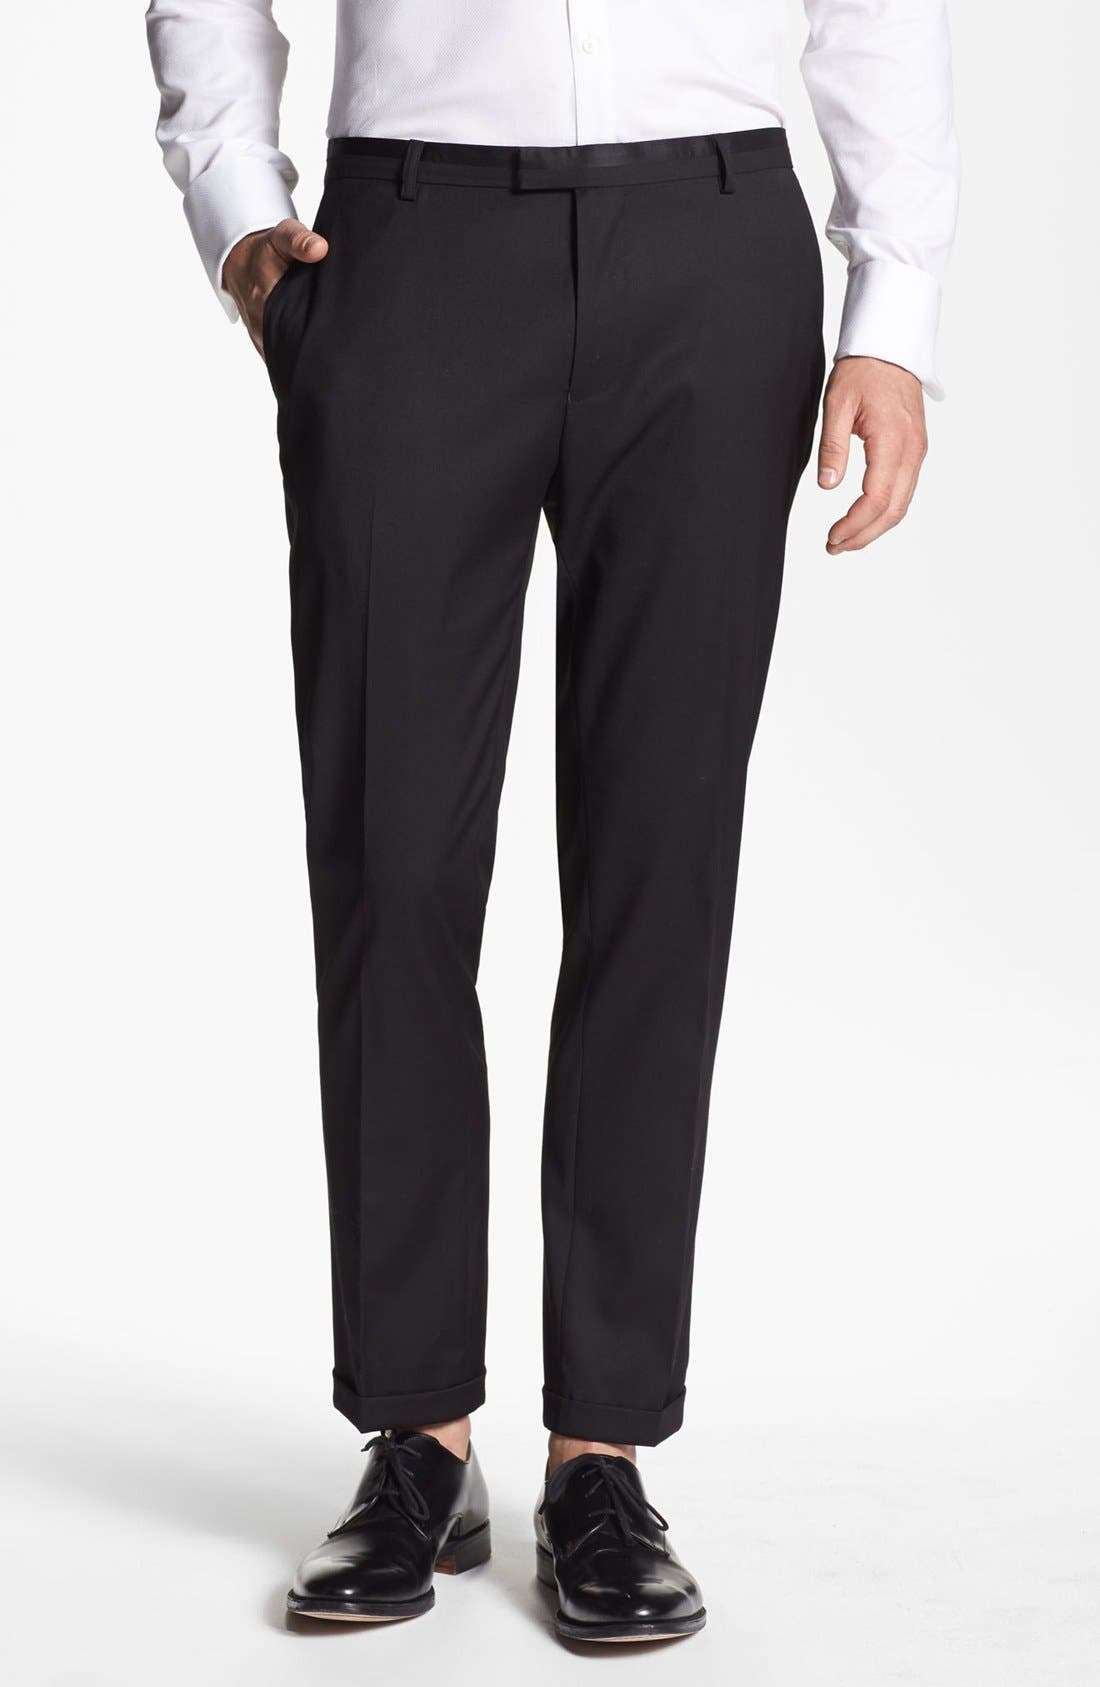 Alternate Image 1 Selected - Topman Skinny Fit Tuxedo Trousers